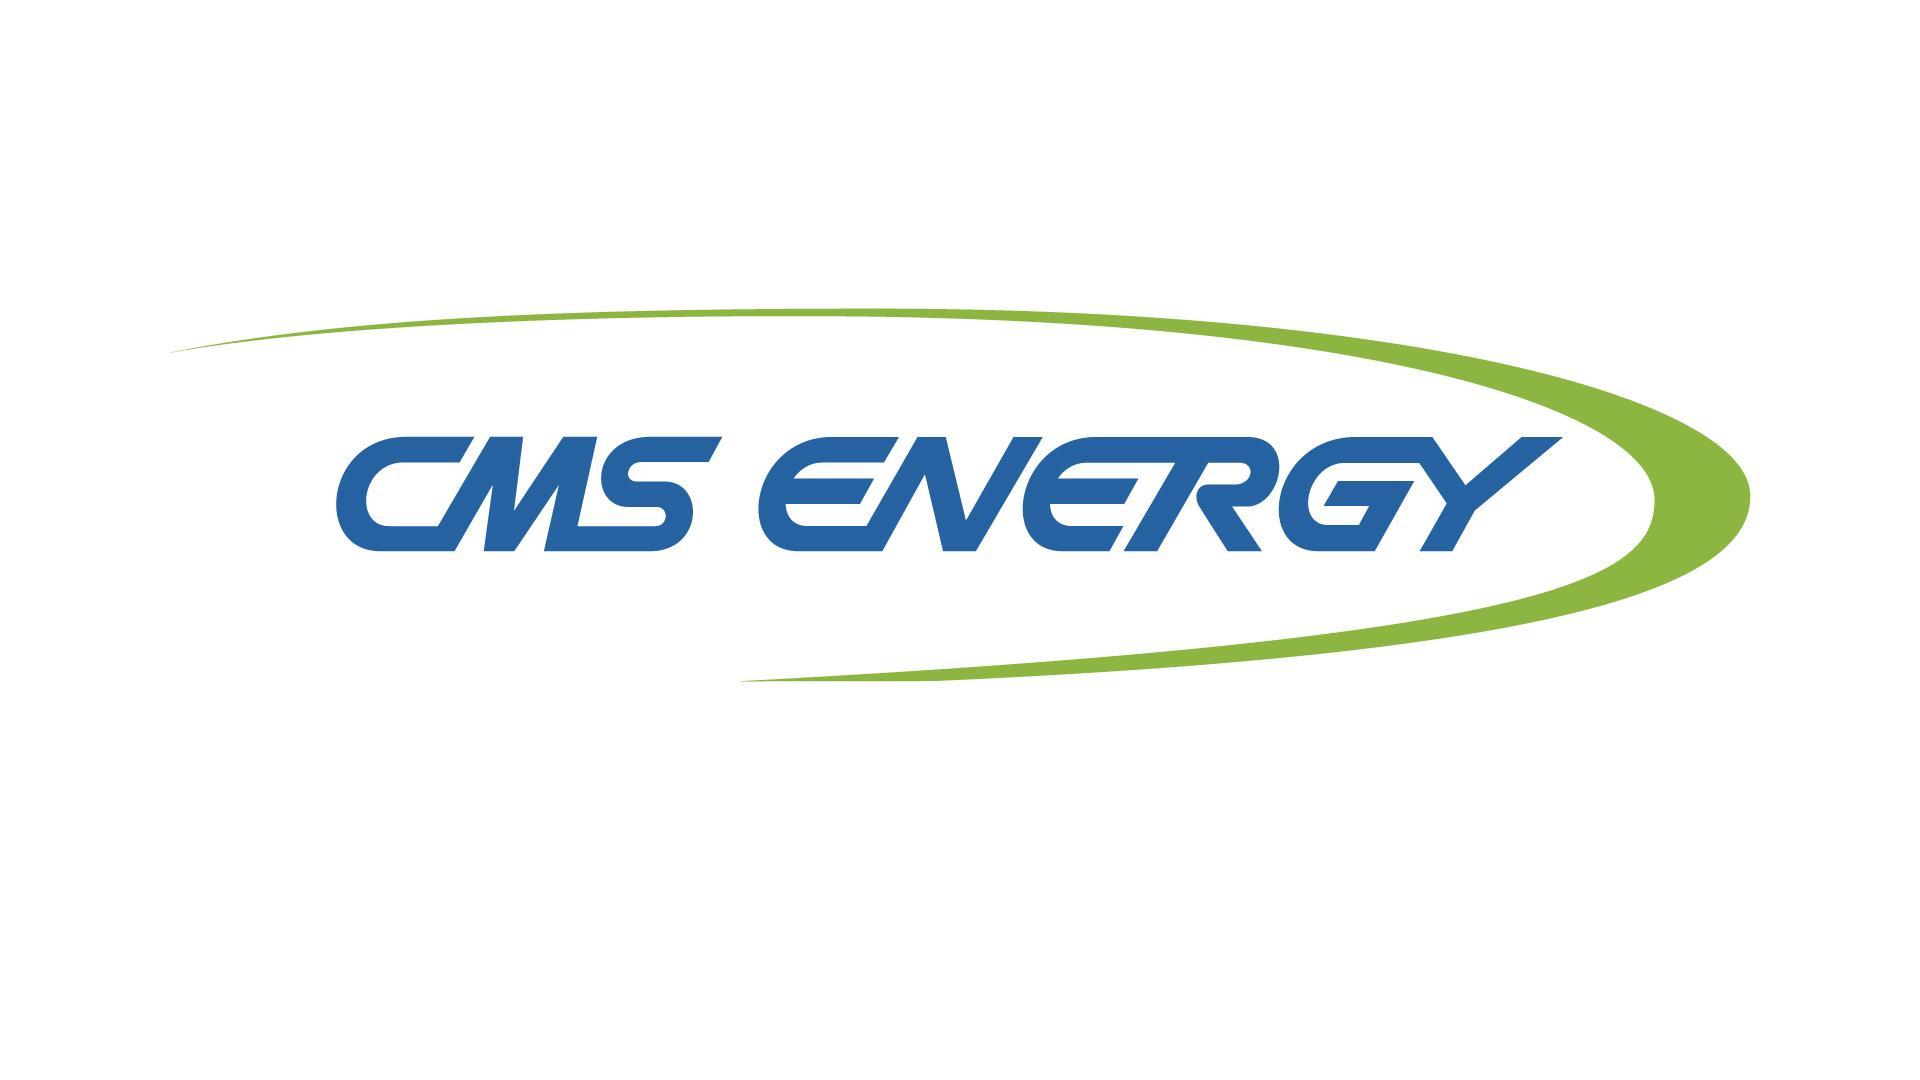 CMS Energy Corporation